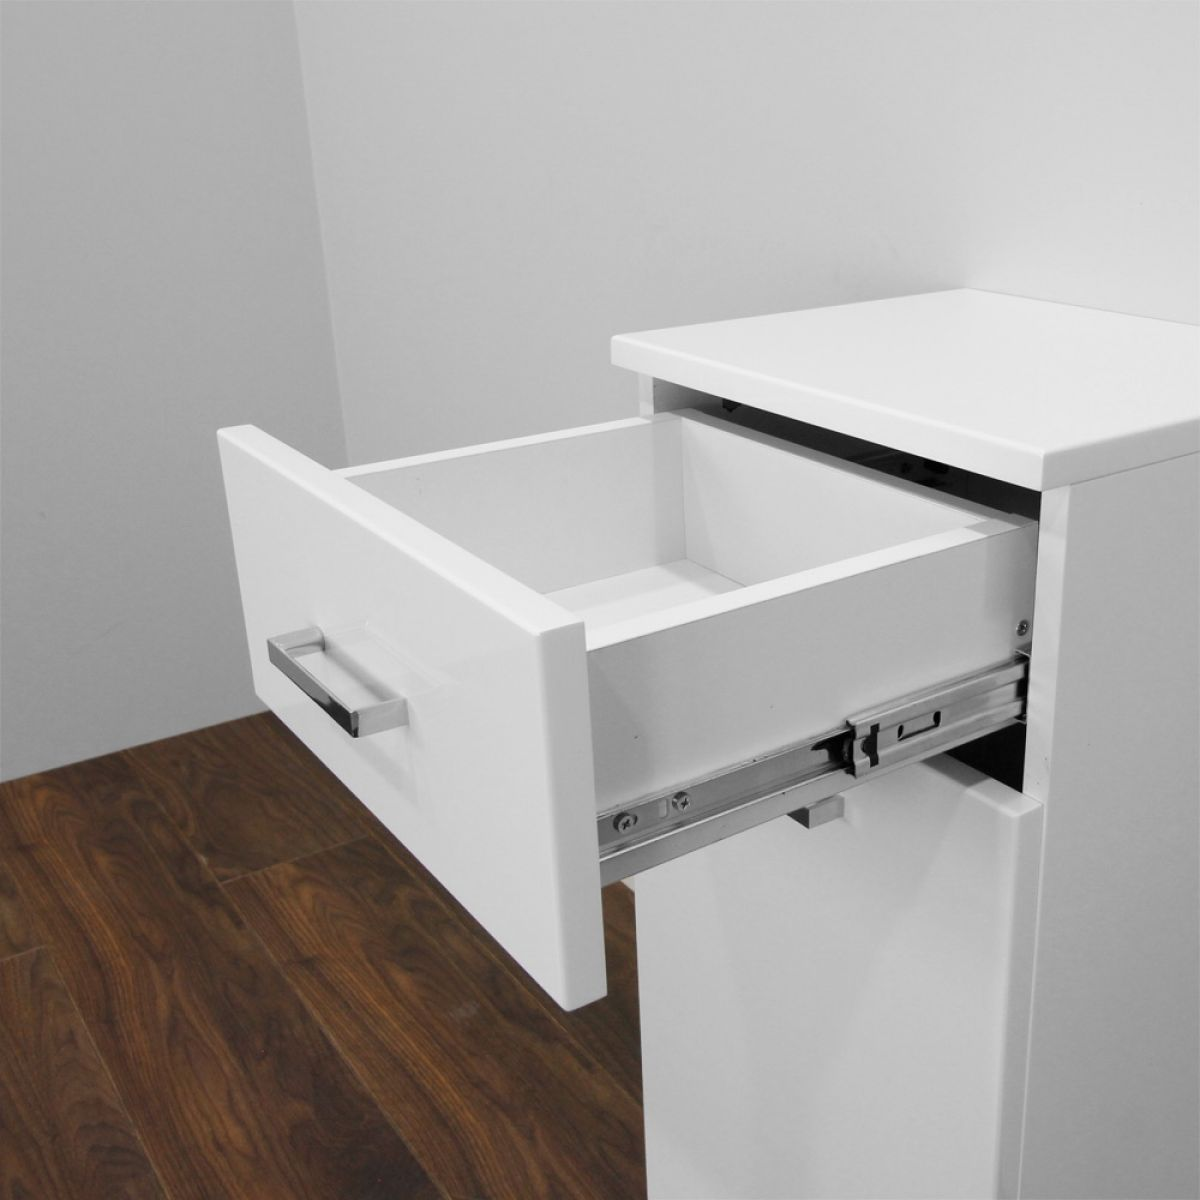 Premier High Gloss White Laundry Basket - Drawer